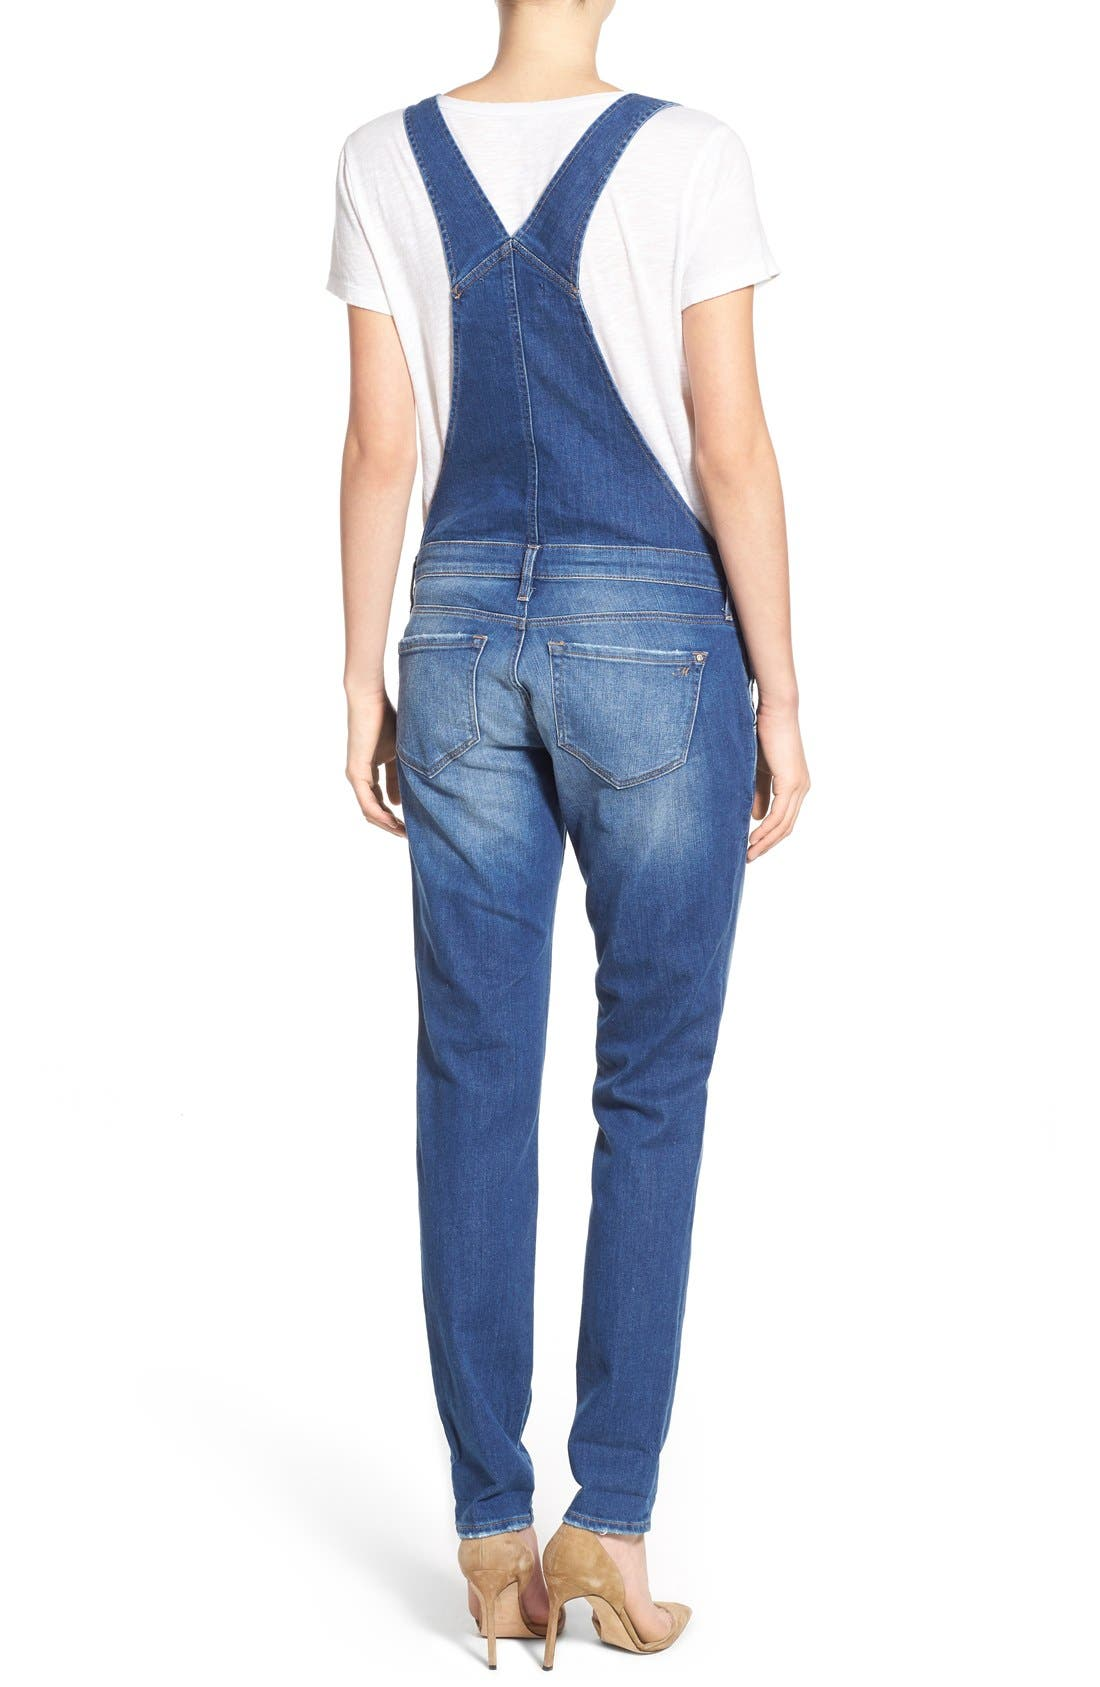 Alternate Image 2  - Mavi Jeans 'Edera' Ripped Overalls (Patch Ripped)